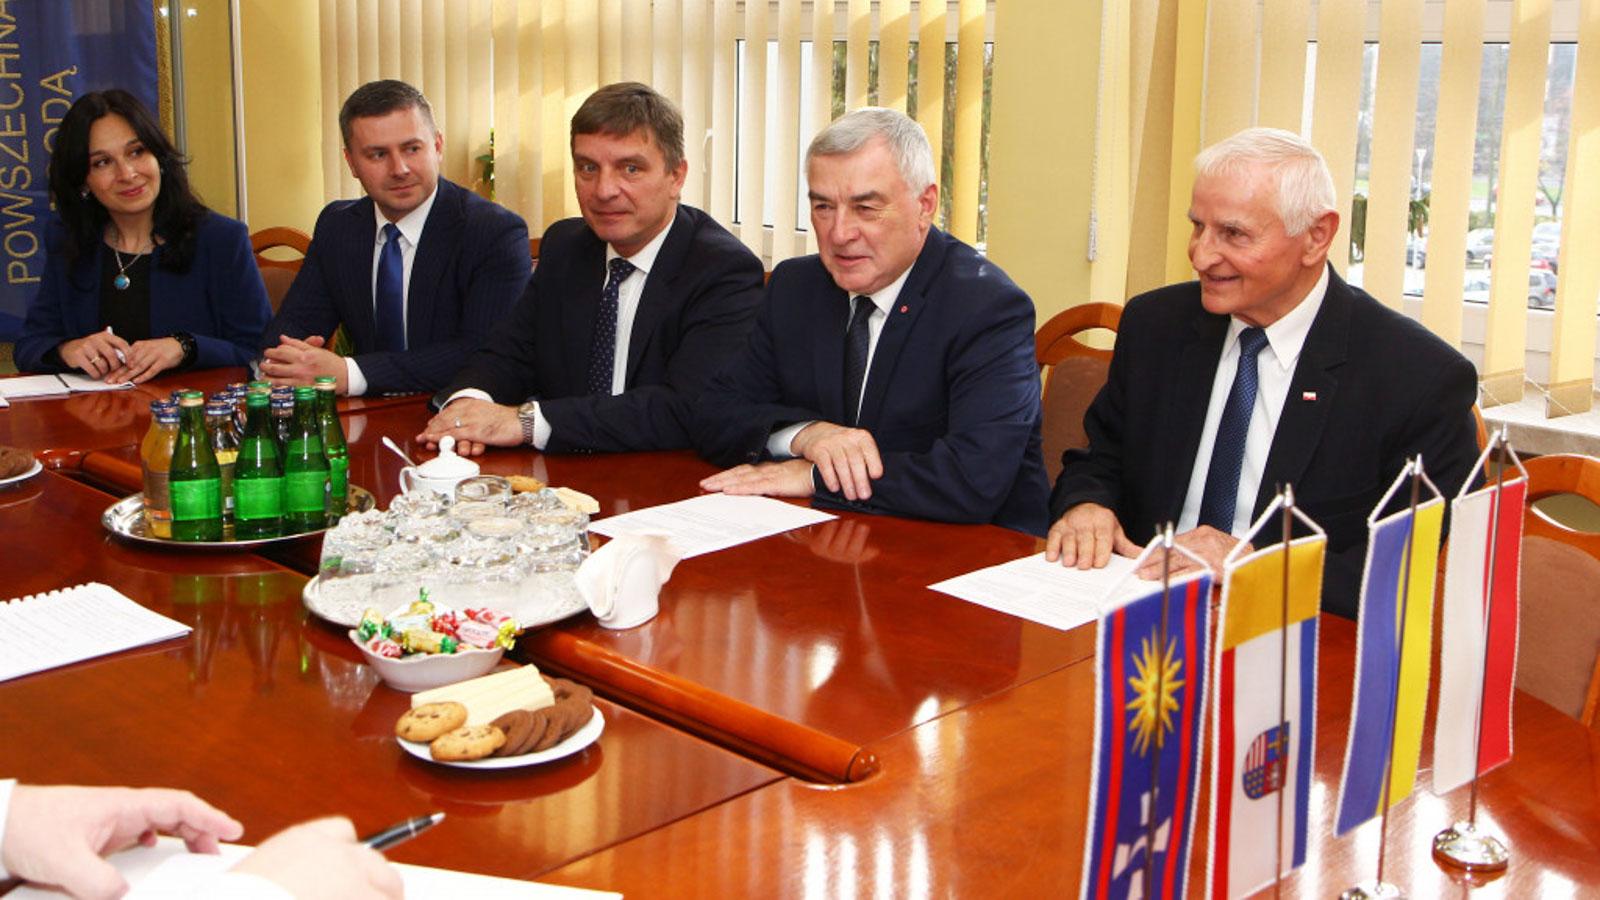 Wizyta-delegacji-z-Ukrainy-1-1024x679